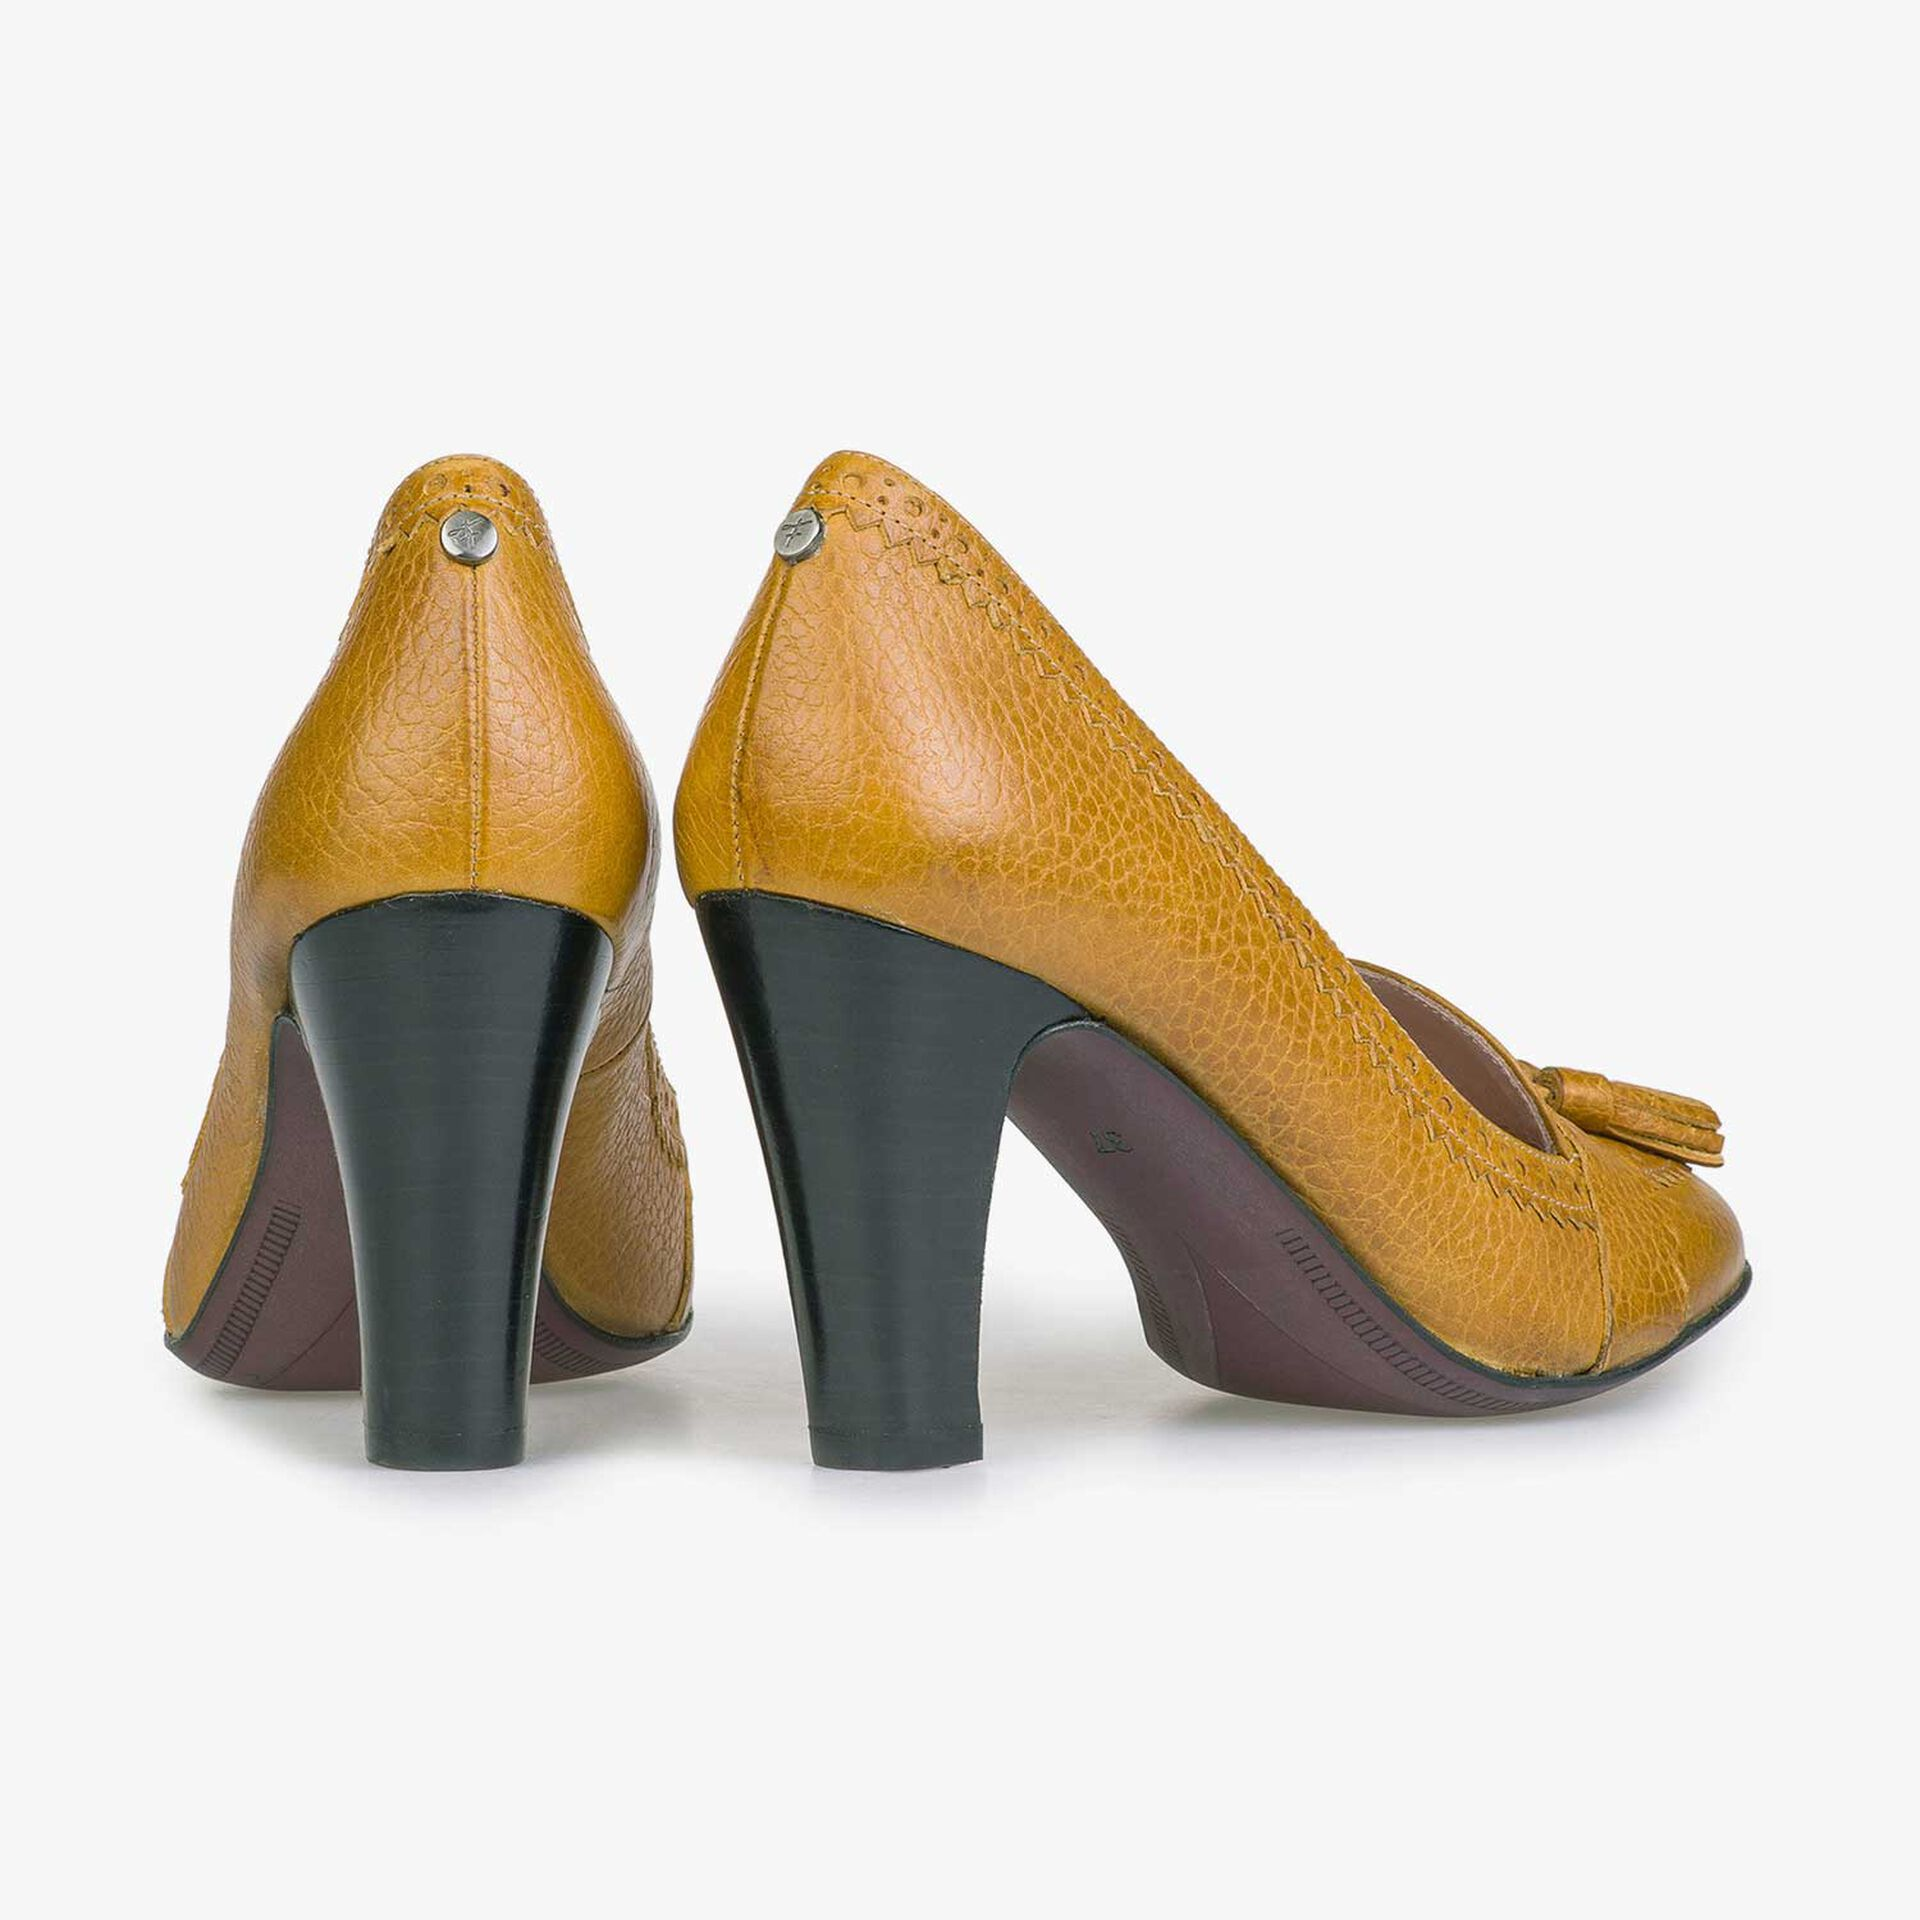 Mustard yellow calf leather tassel high heels